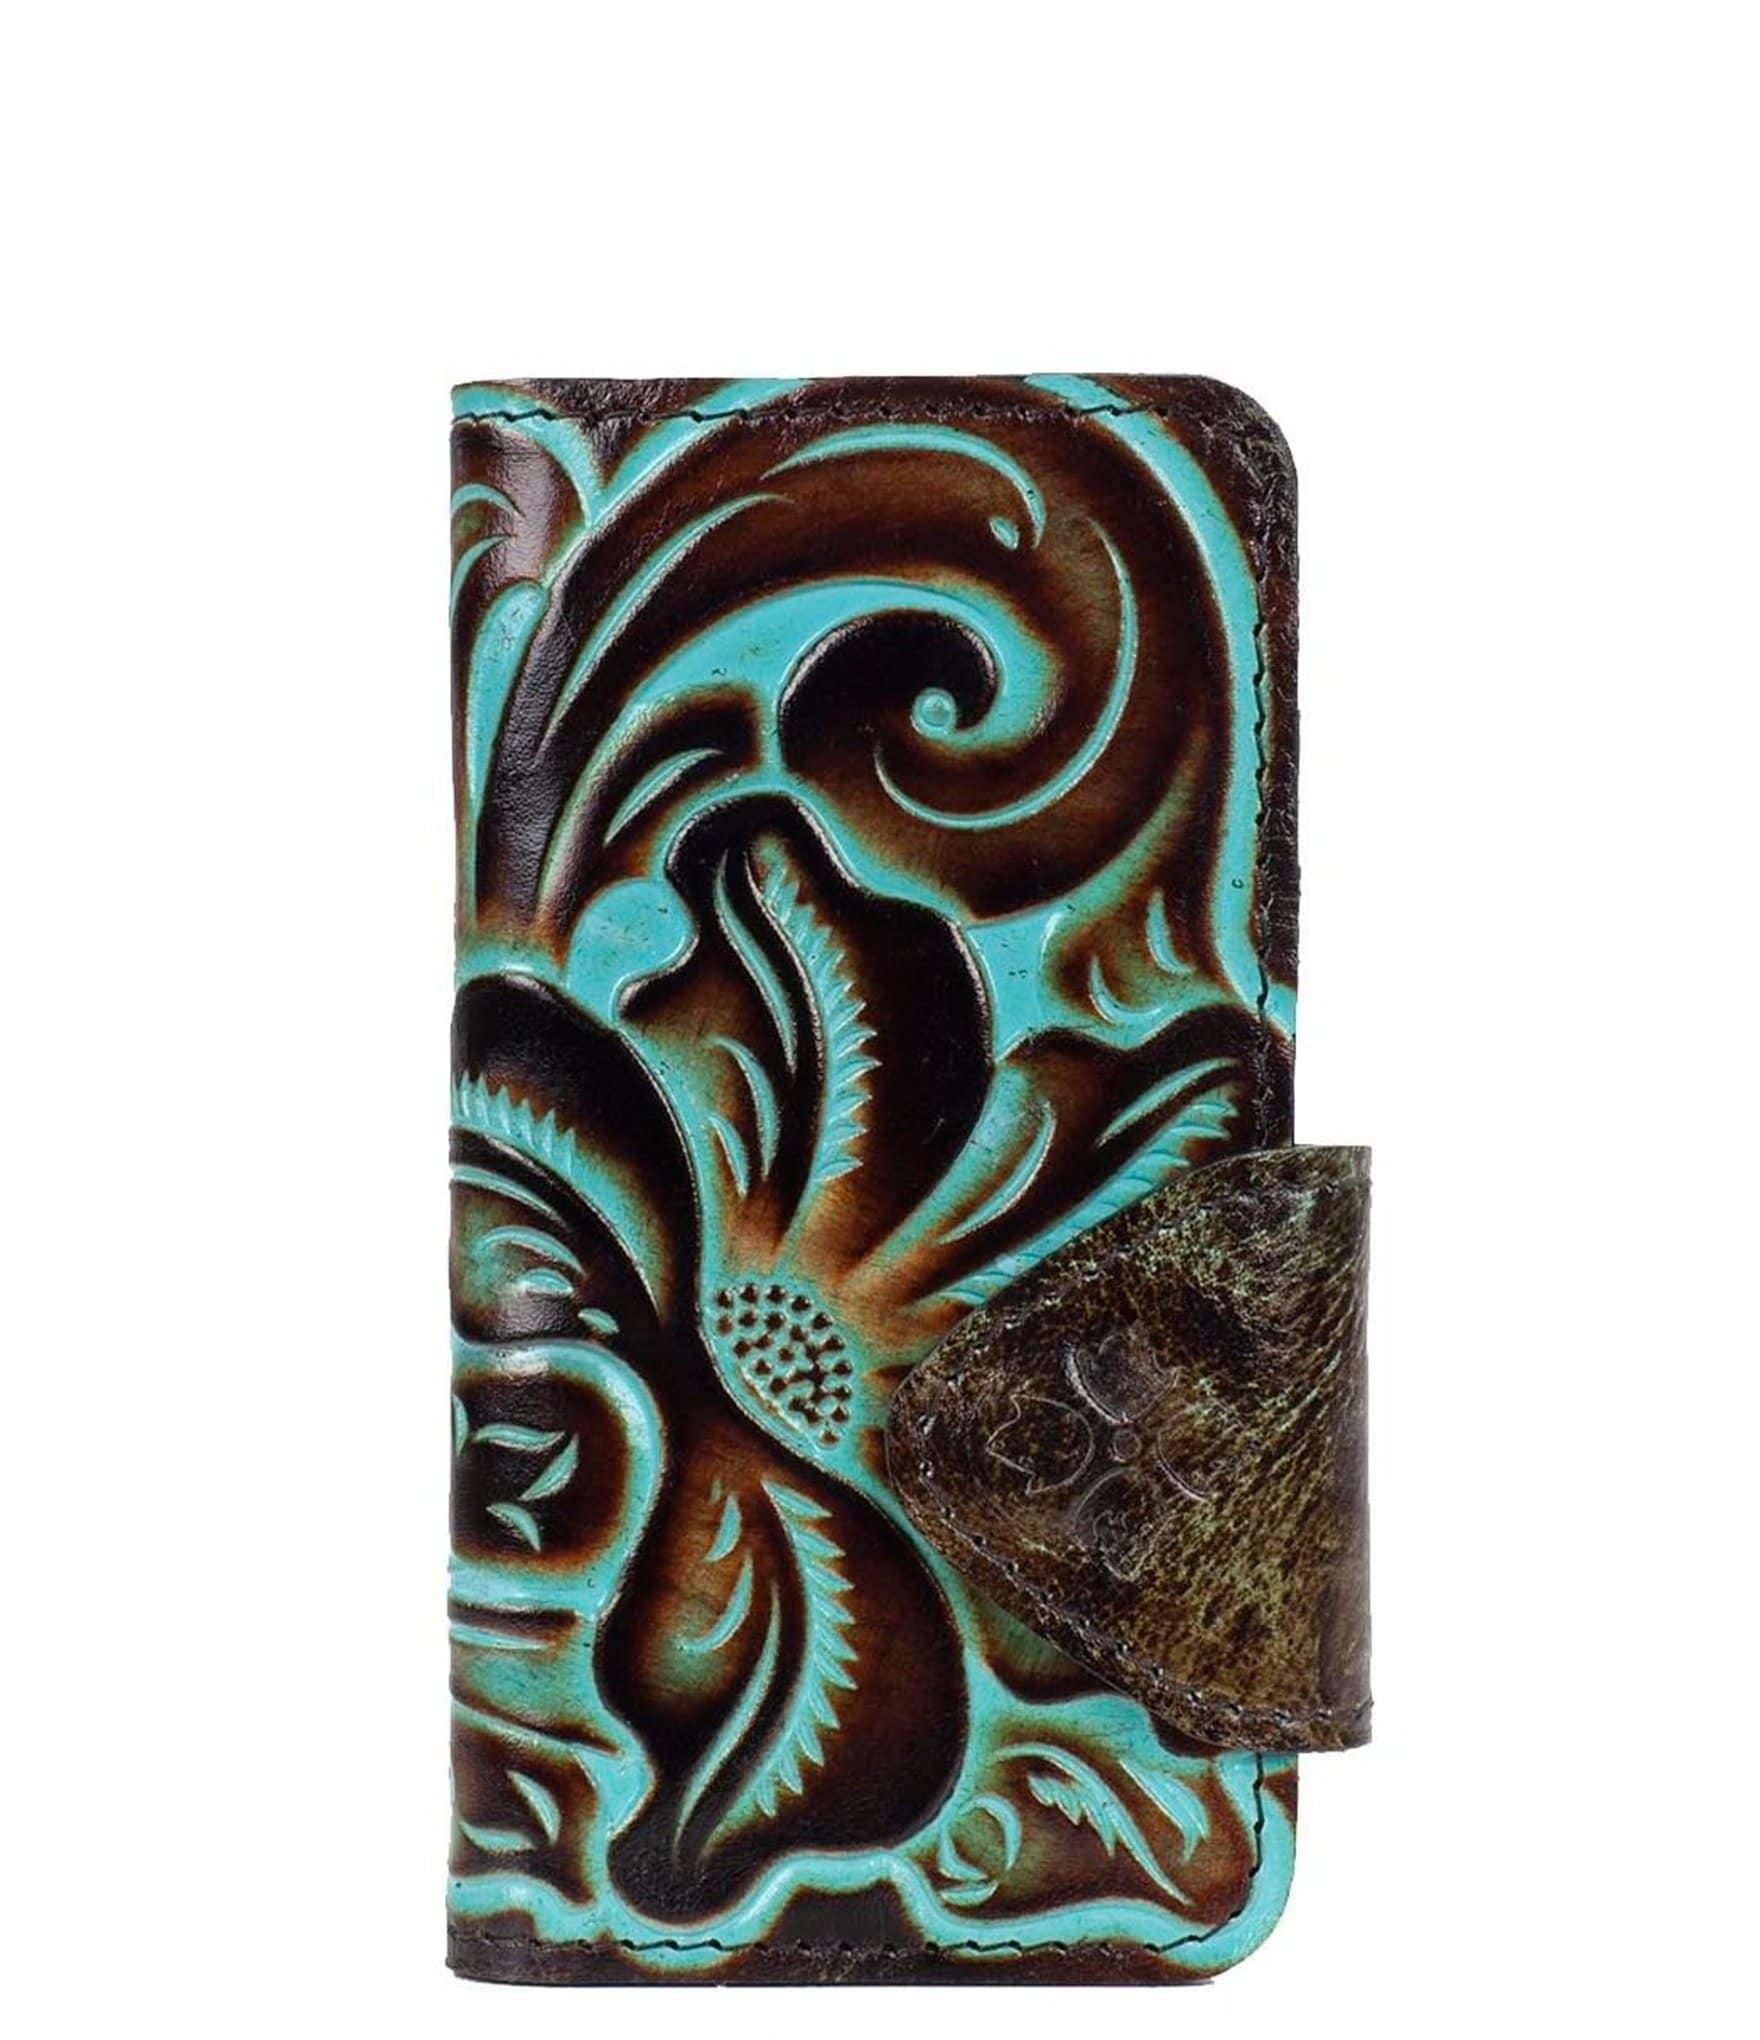 Turquoise Phone Case Iphone